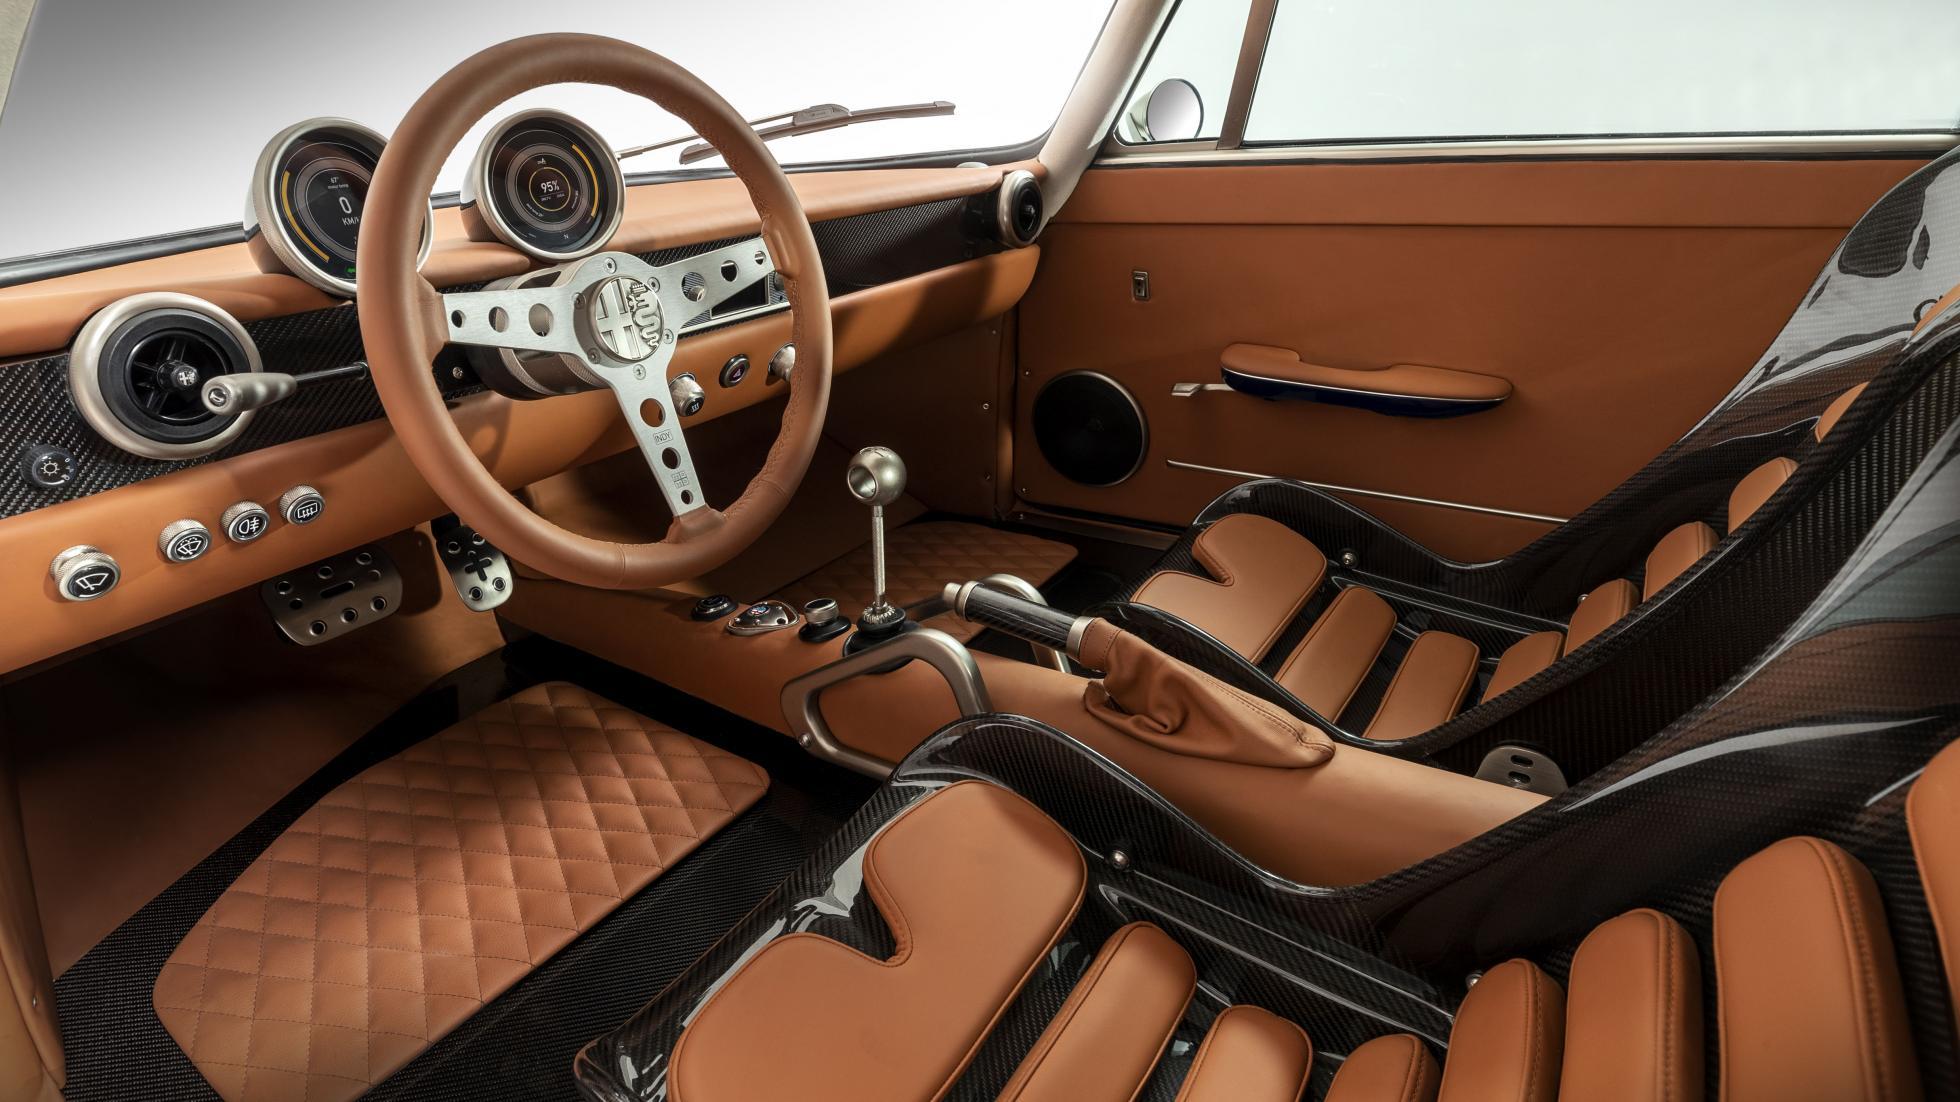 Alfa-Romeo-Giulia-GT-Electric-by-Totem-Automobili-11